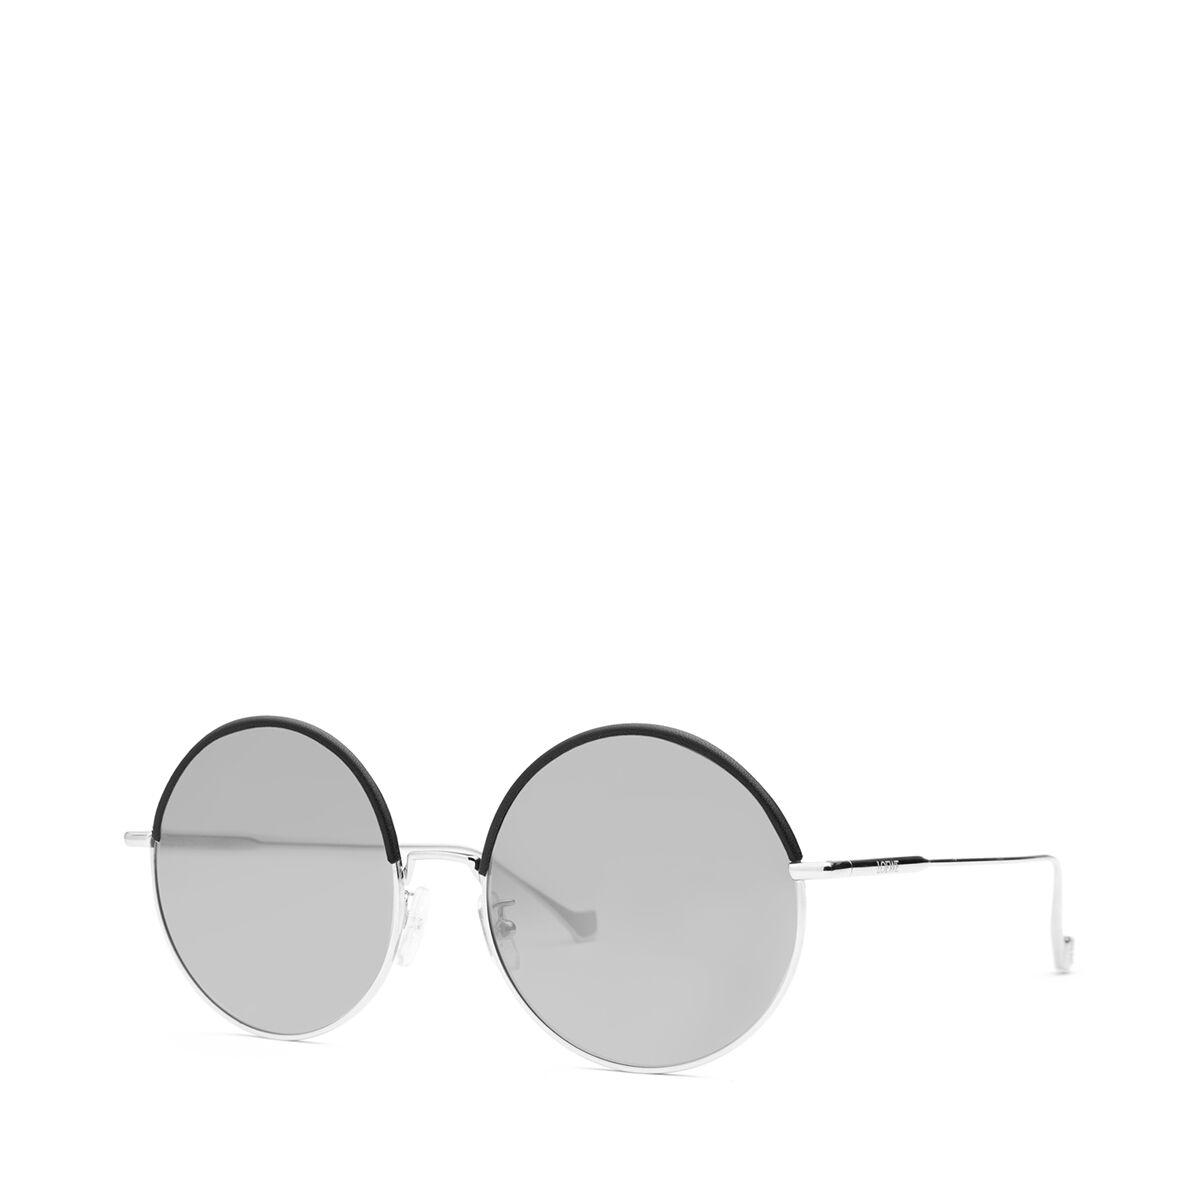 LOEWE Gafas Redondas Negro/Humo Degradado all